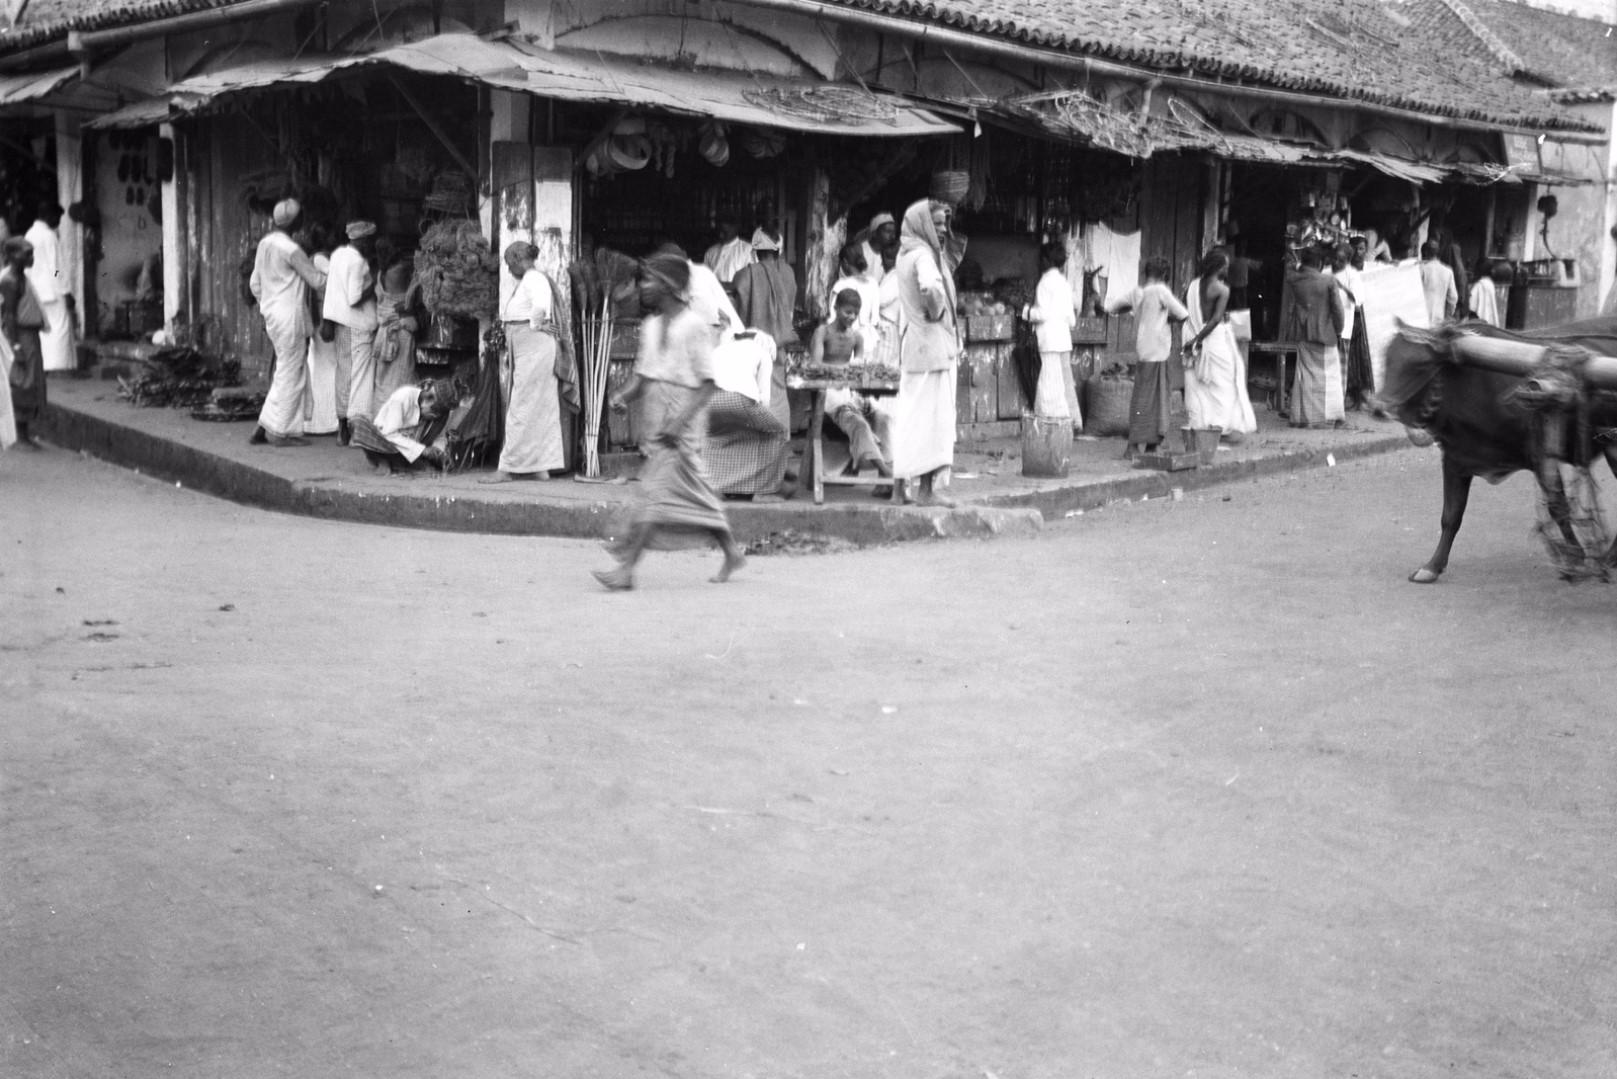 225. Магазины на базаре в Канди